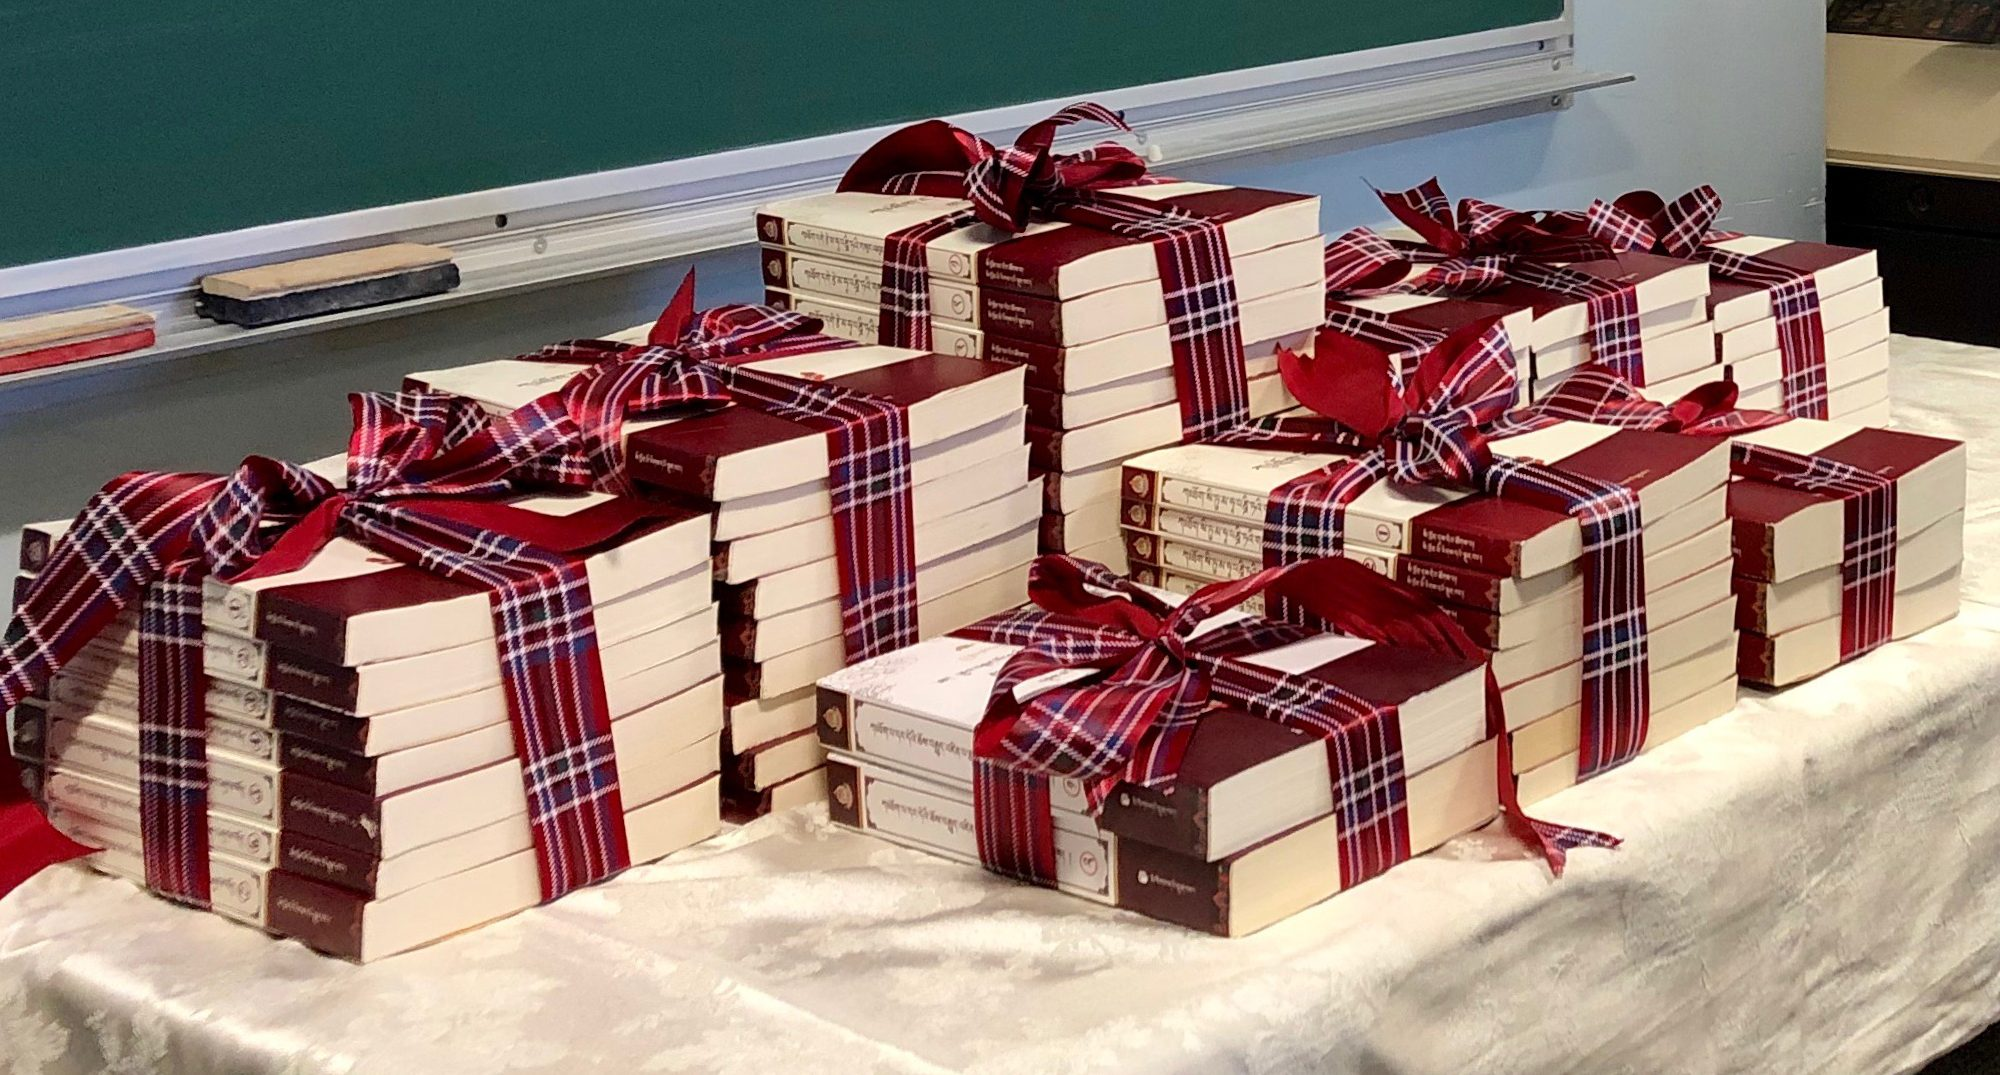 Welcoming New Tibetan Books from Kathog Trungpa Rinpoche